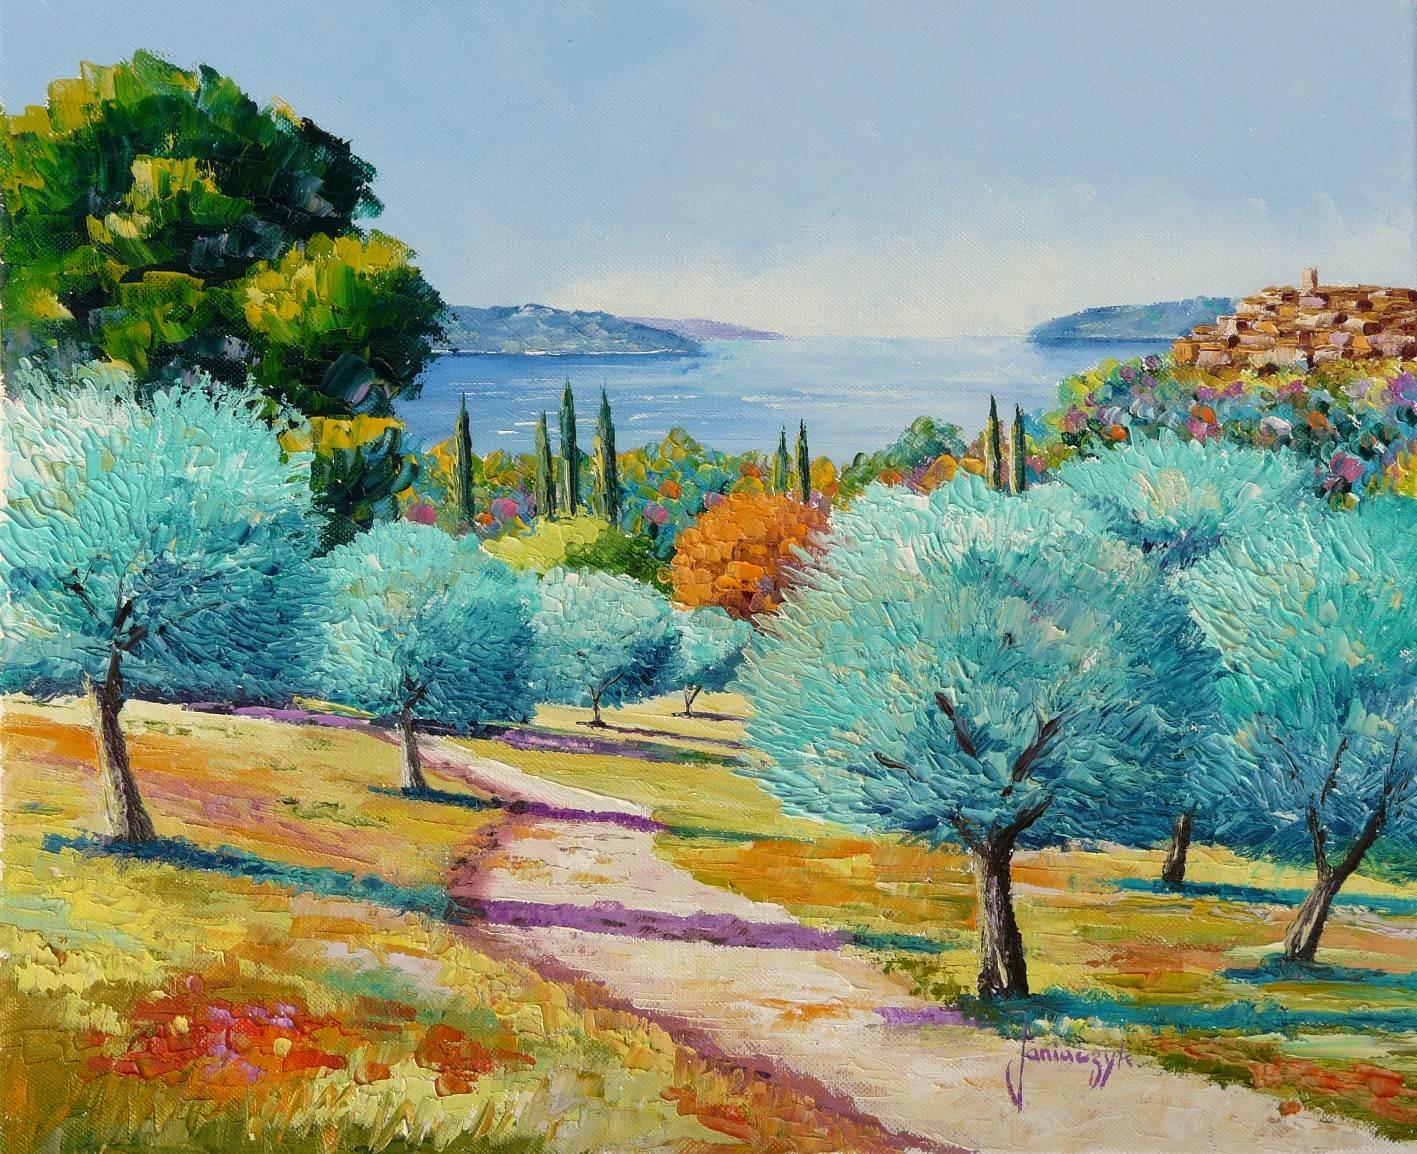 Azeitonas do Mediterrâneo - Cores alegres e vibrantes nas paisagens de Jean-Marc